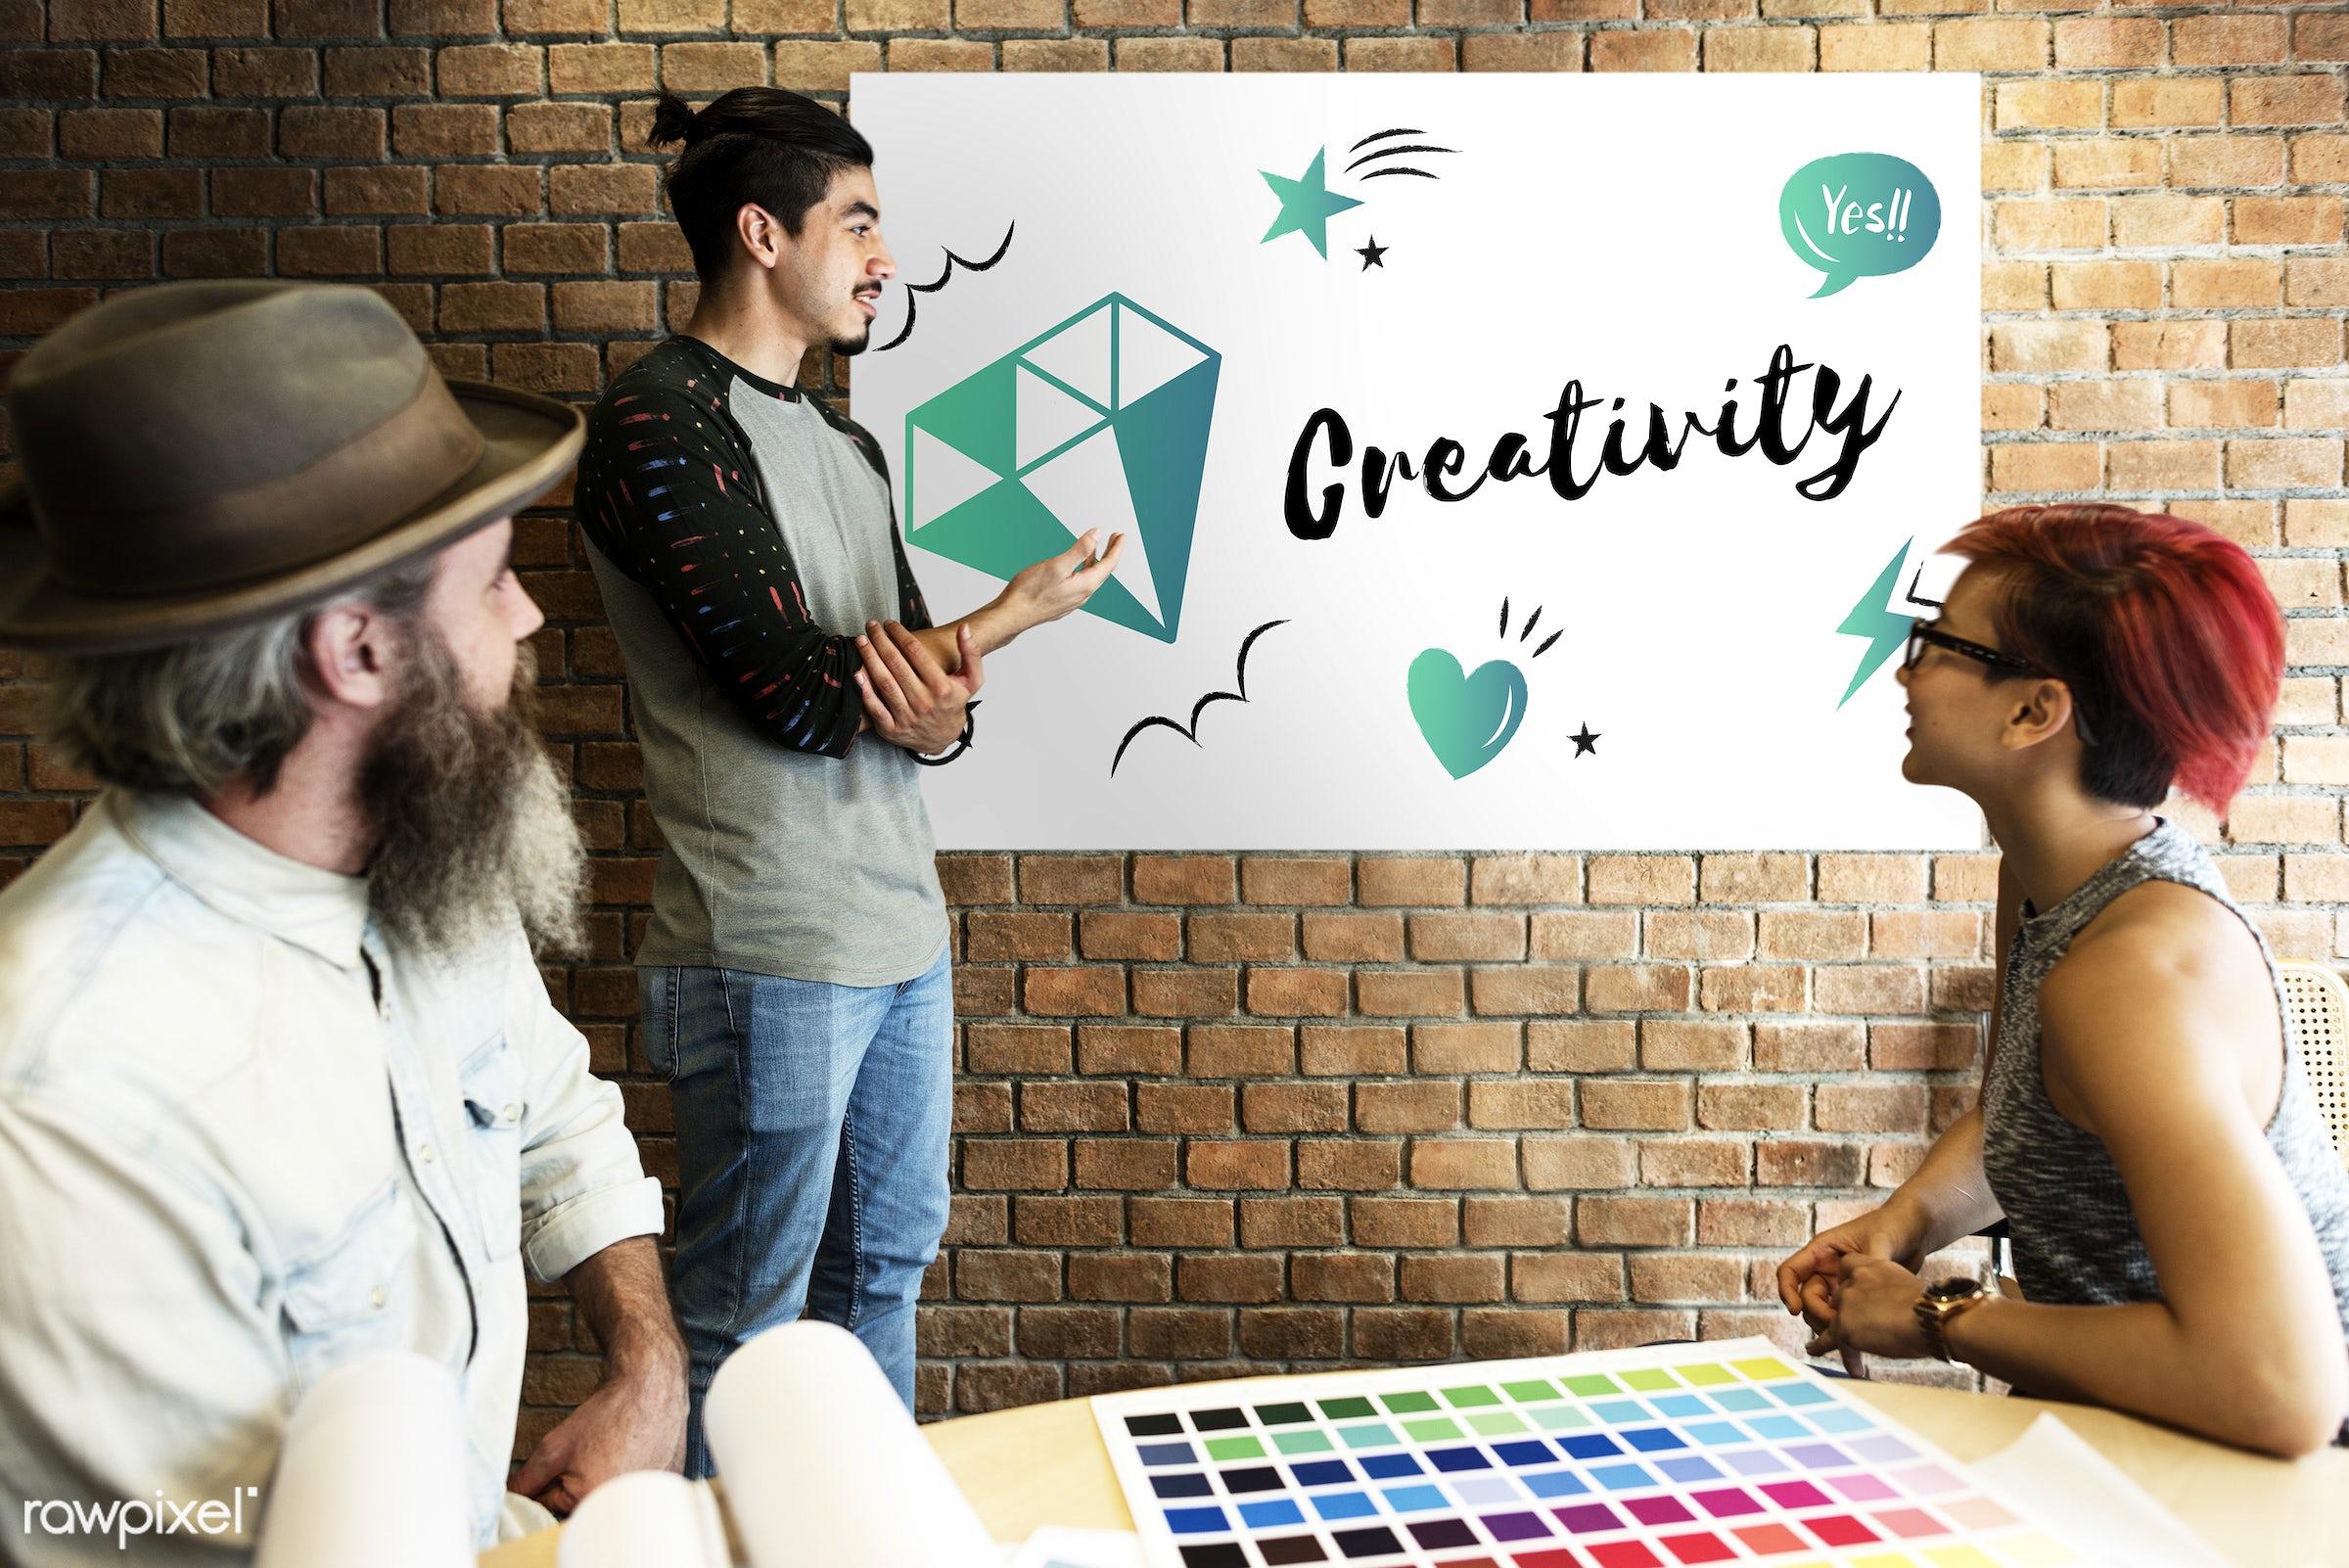 art, be creative, beard, blueprint, board, brick wall, chart, color chart, colors, creative, creativity, design, diamond,...